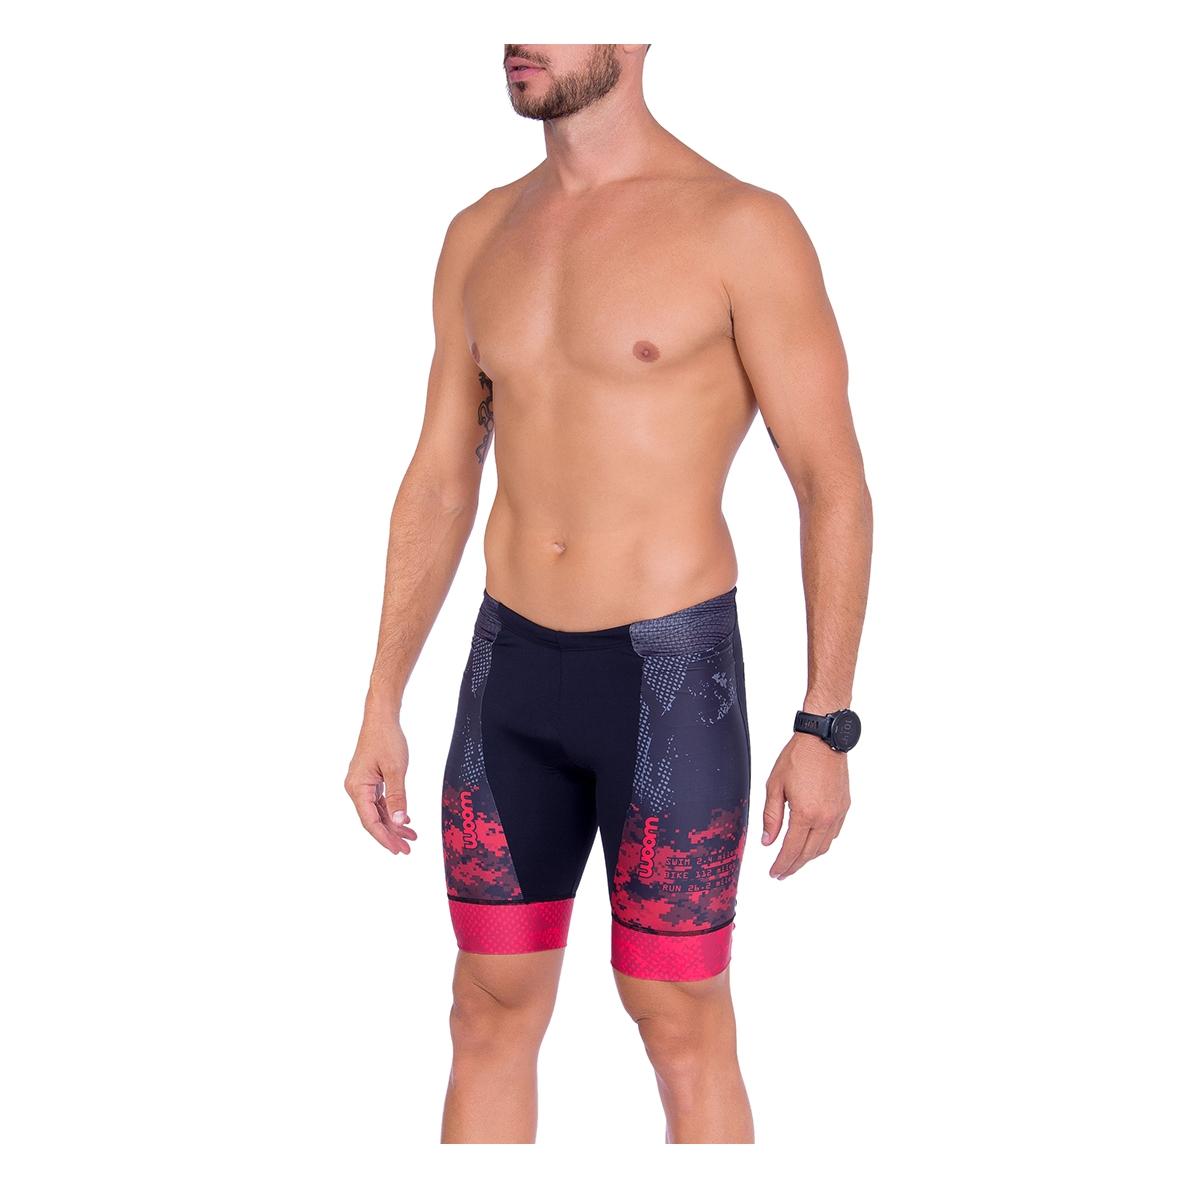 Bermuda Triathlon 140 Brave Masc - 2021